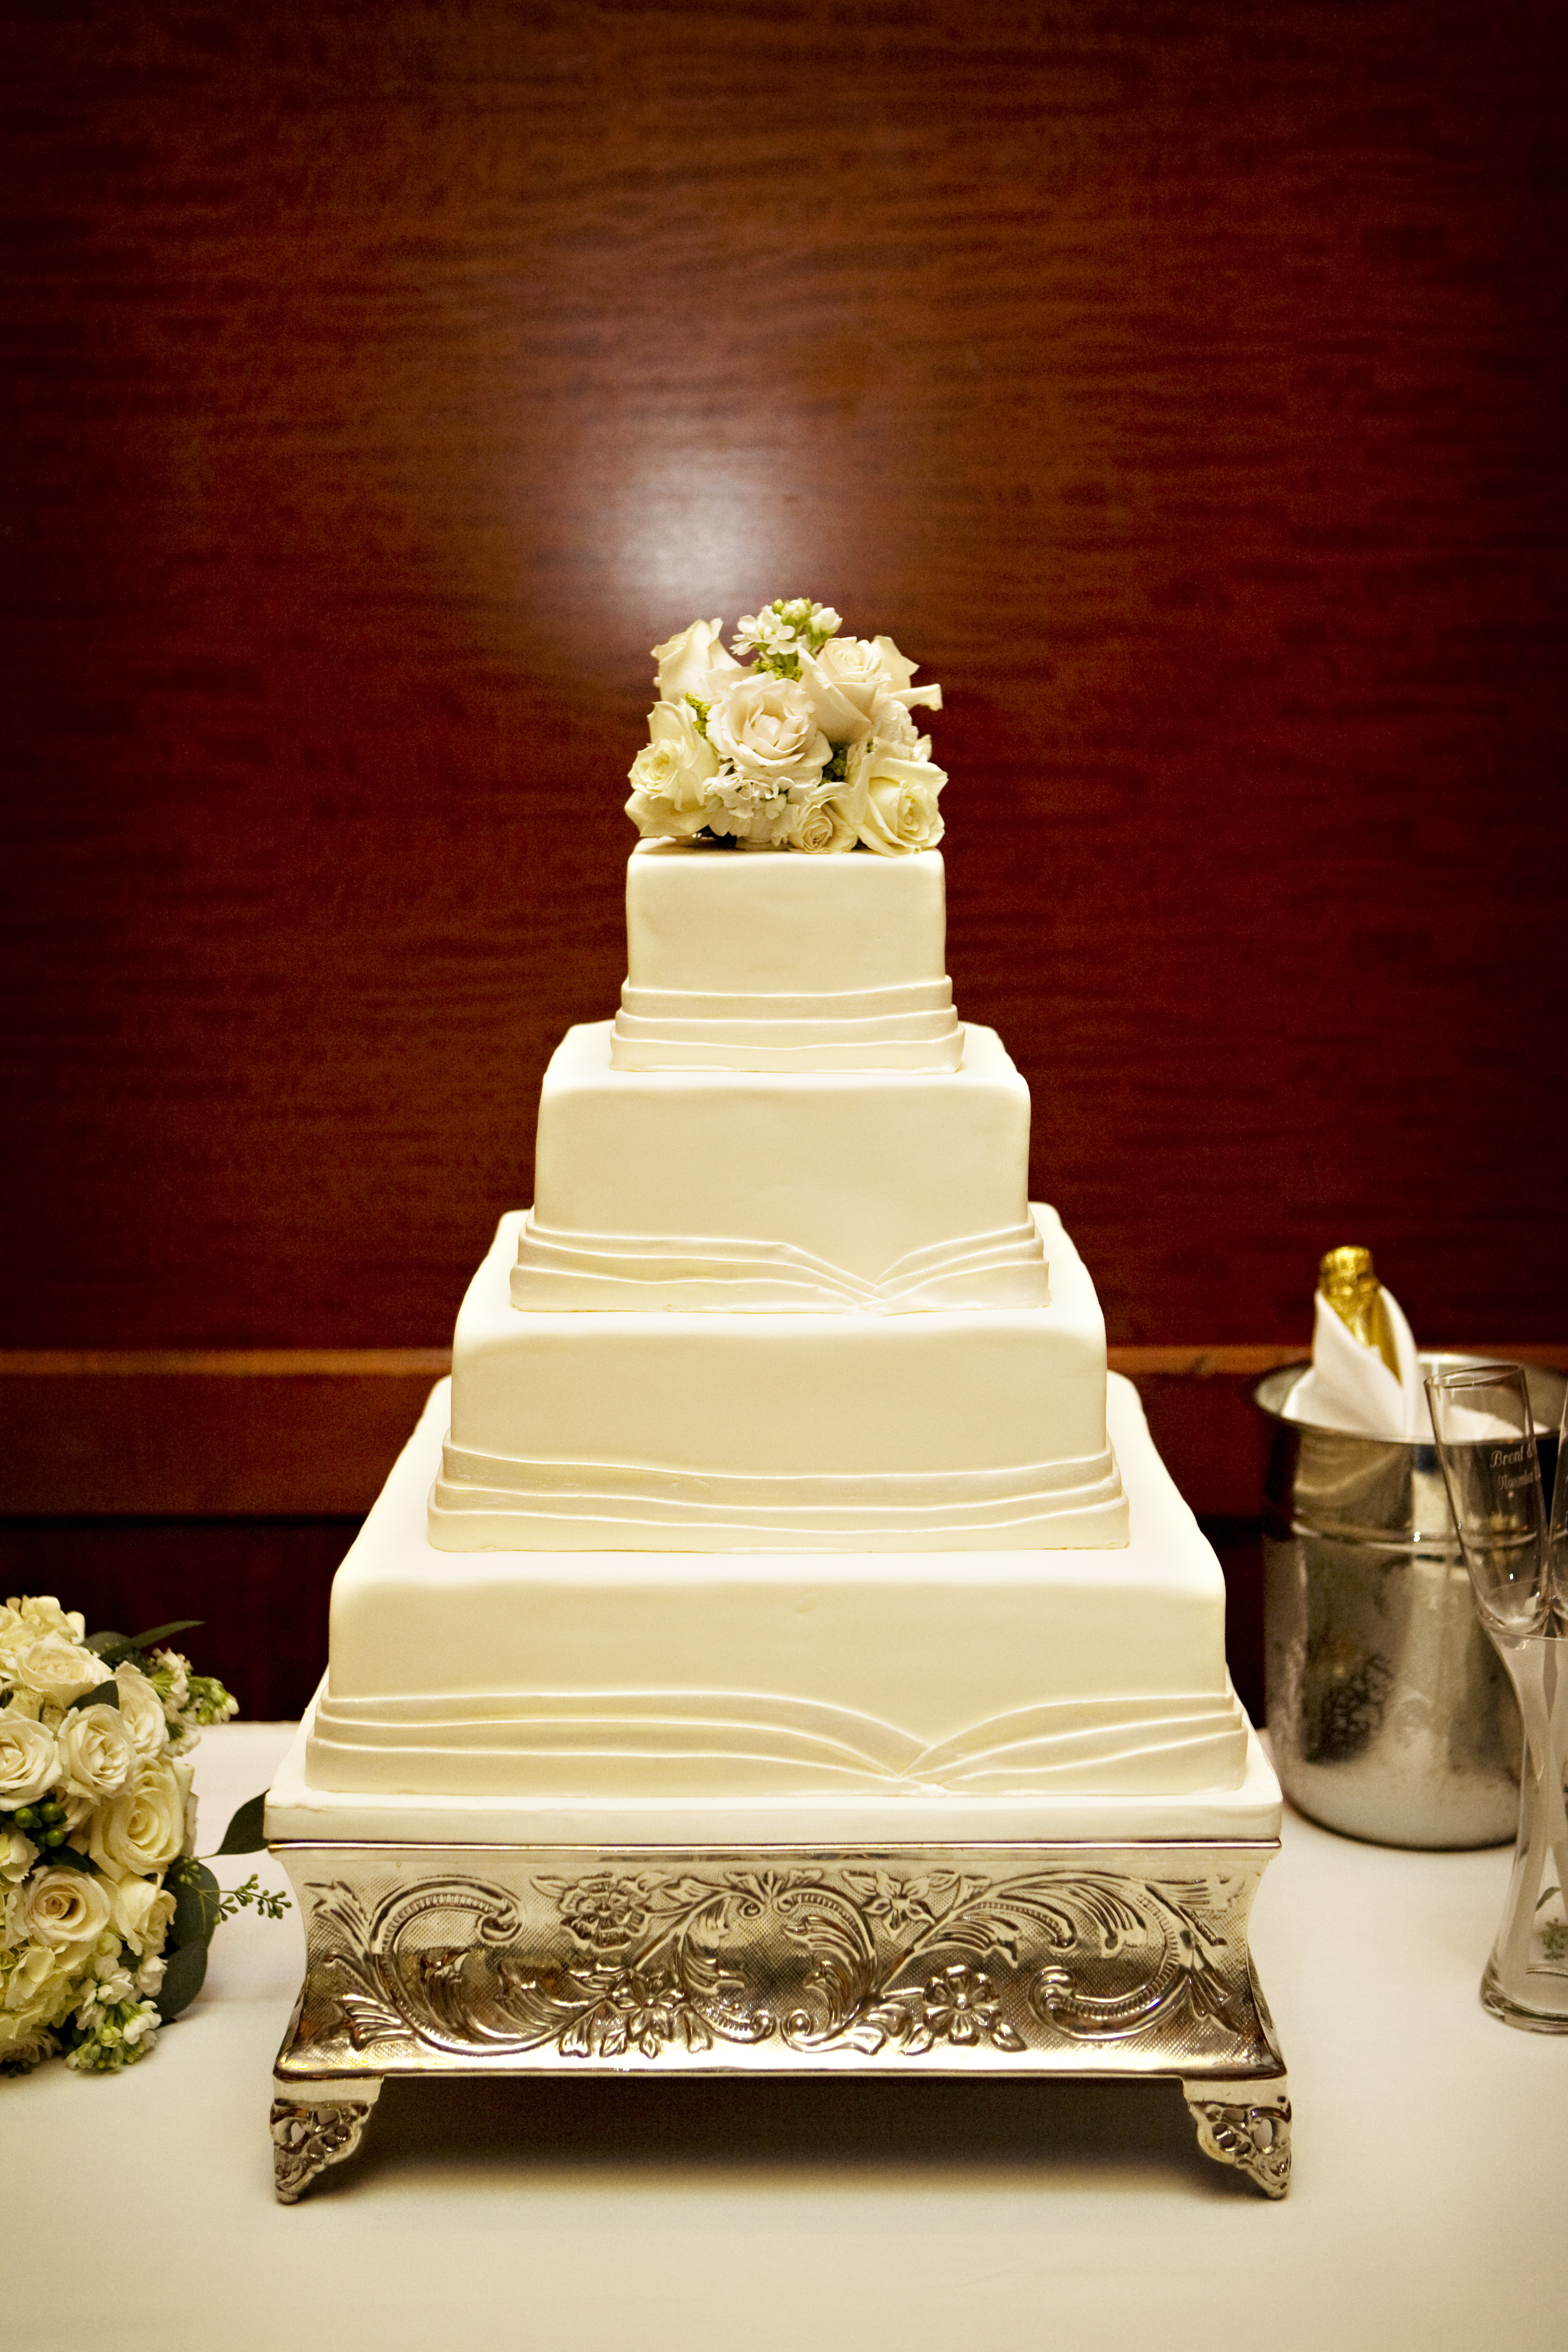 My Weblog/Sugar Seminars: \'Tis the Season-Wedding Season, That is